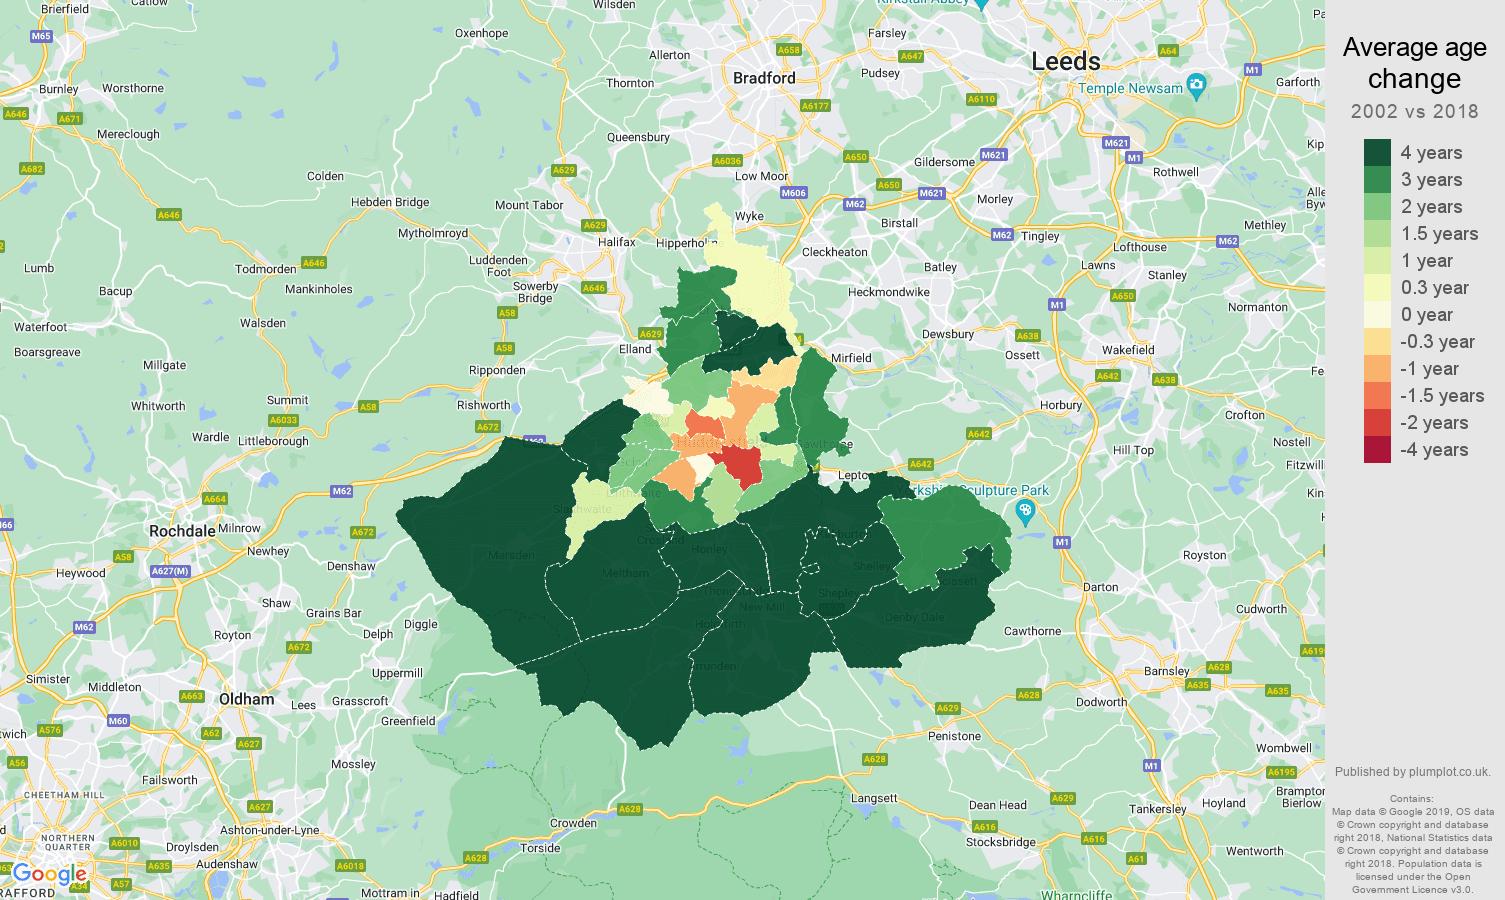 Huddersfield average age change map